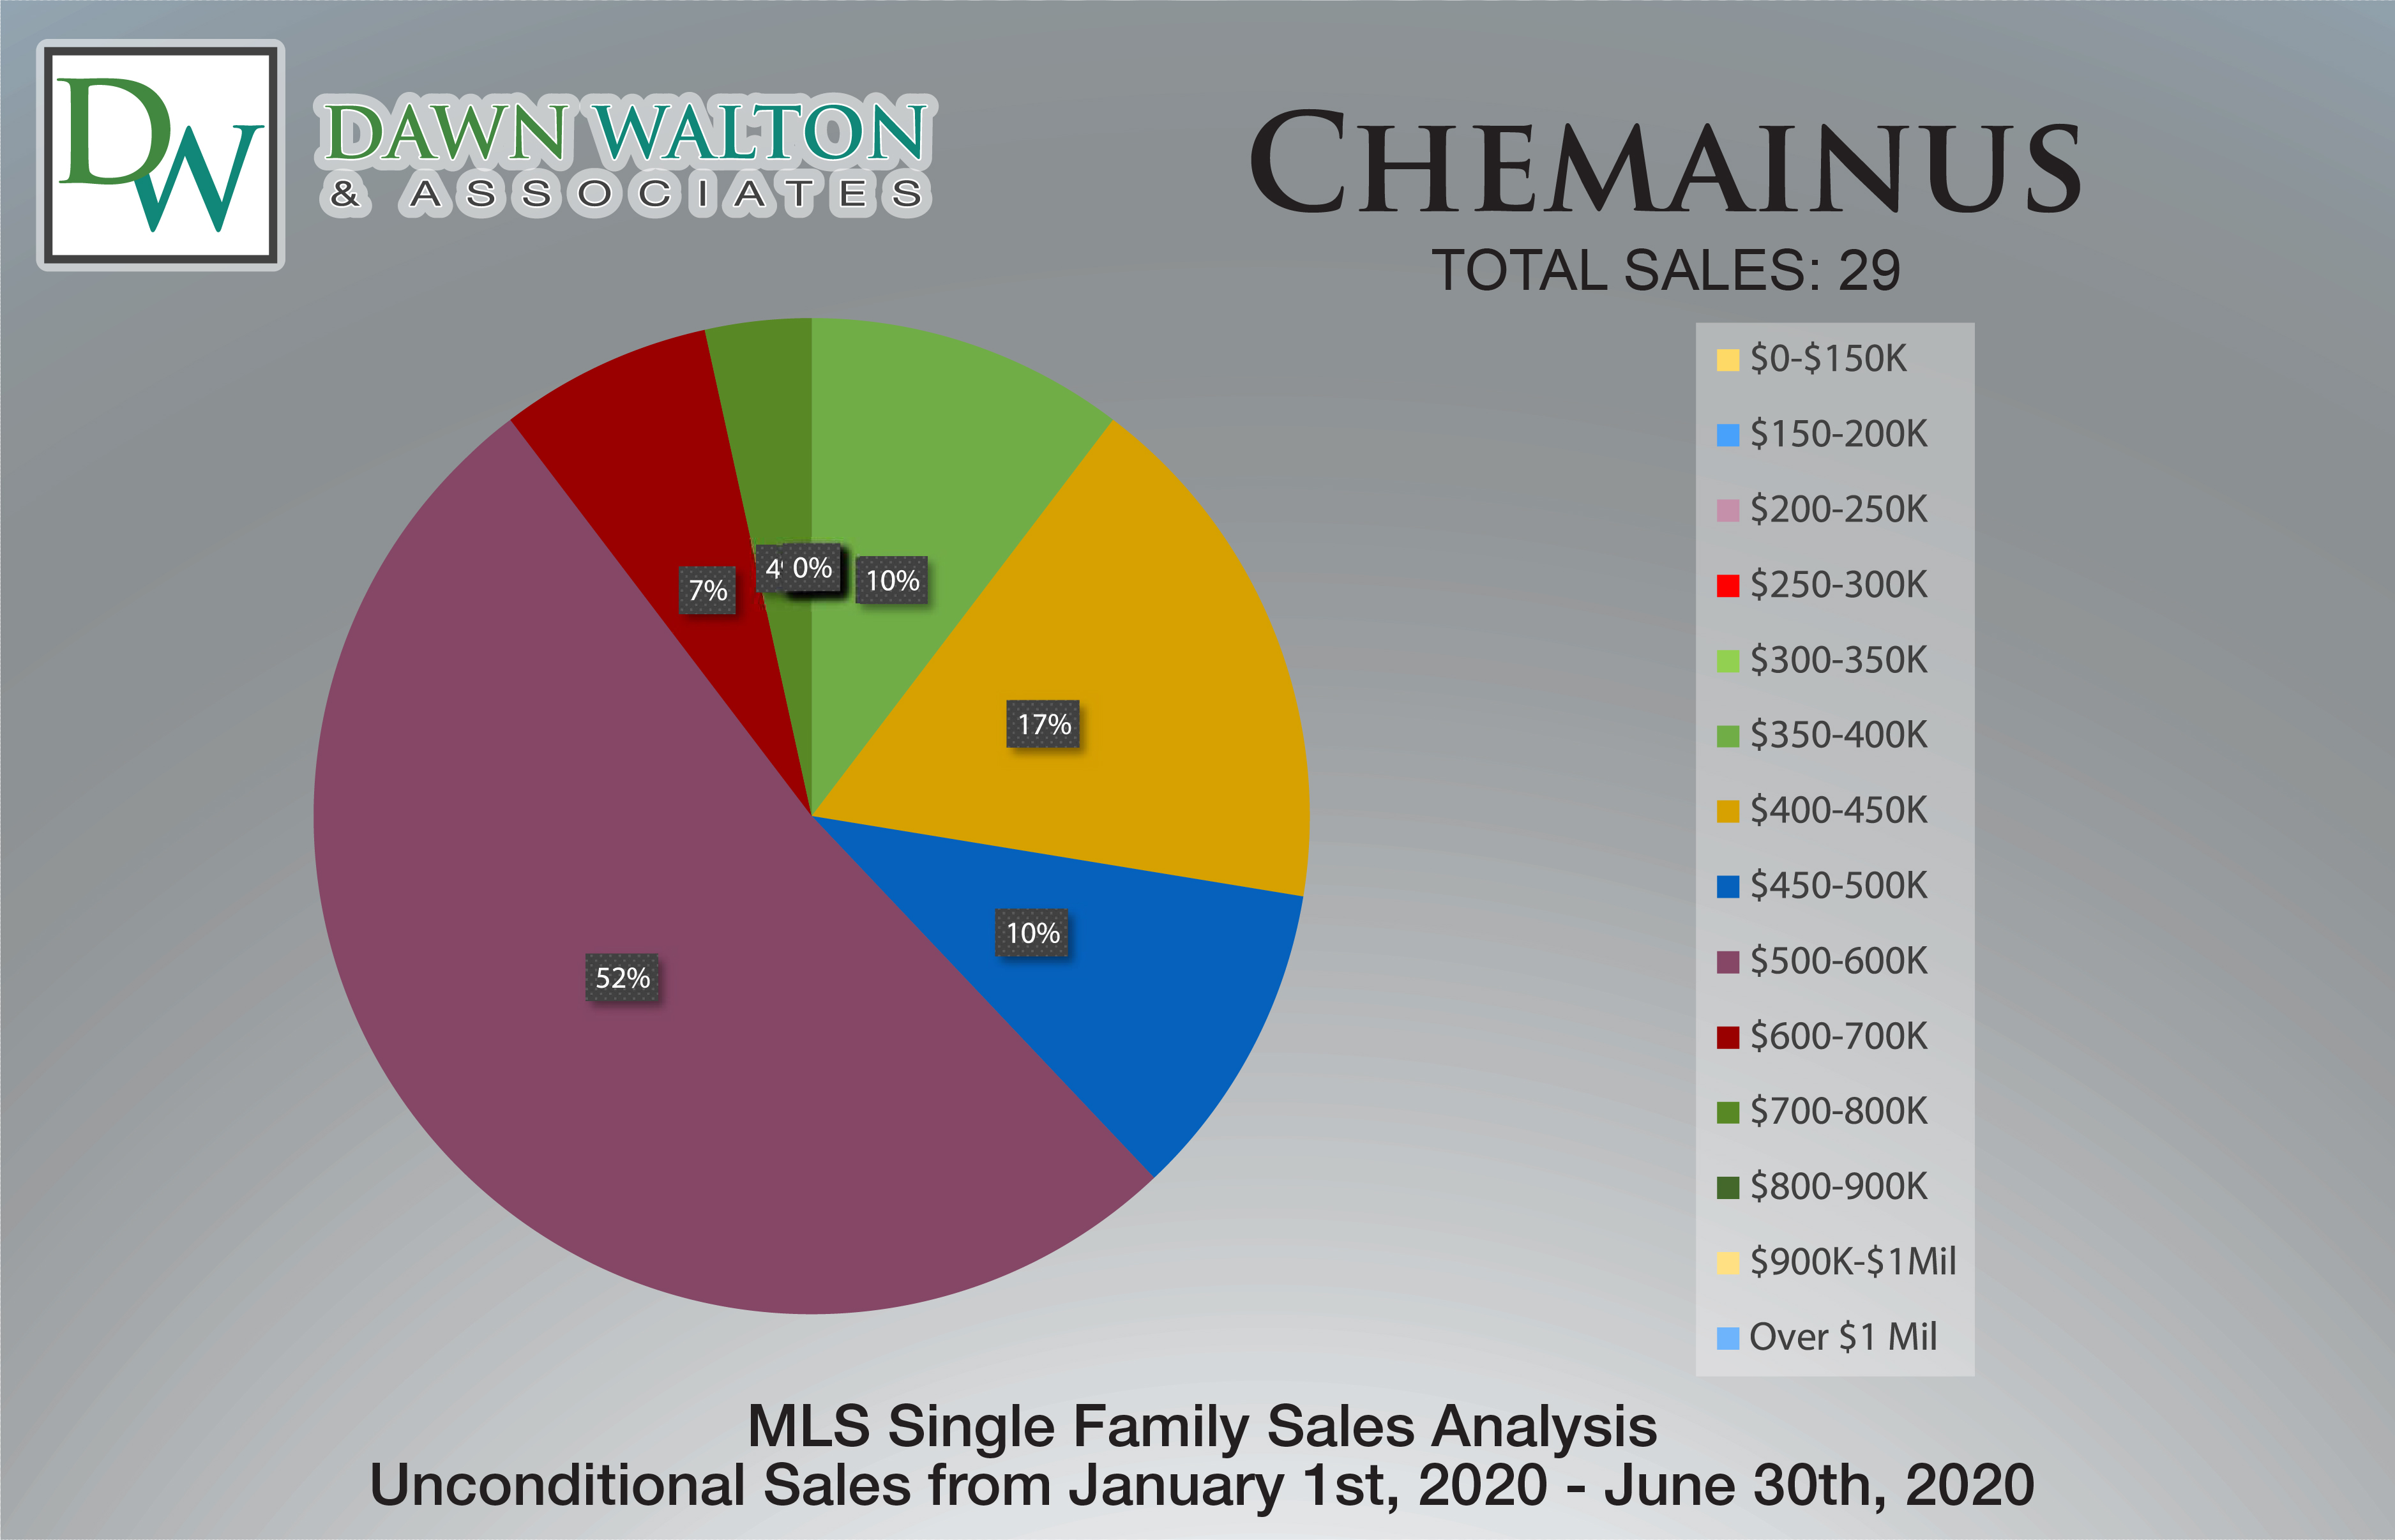 Chemainus Real Estate Market Stats Price Percentage Jan 1- June 30th  2020 - Nanaimo Realtor Dawn Walton